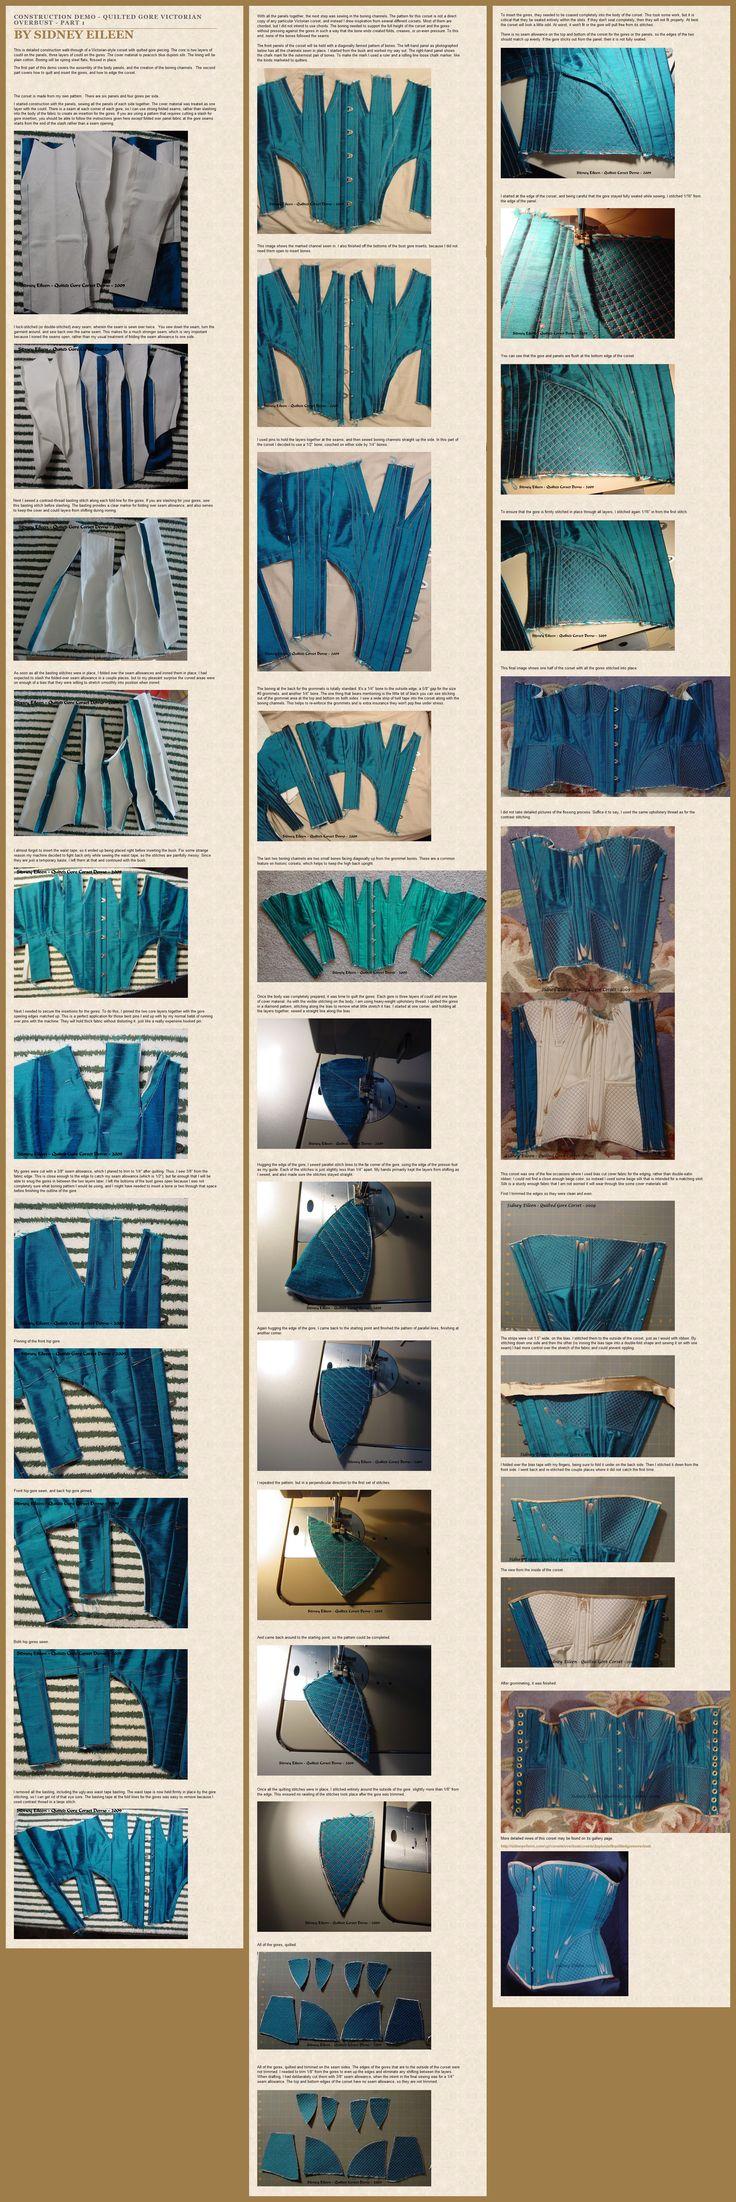 Making a Quilted Gore Corset by sidneyeileen.deviantart.com